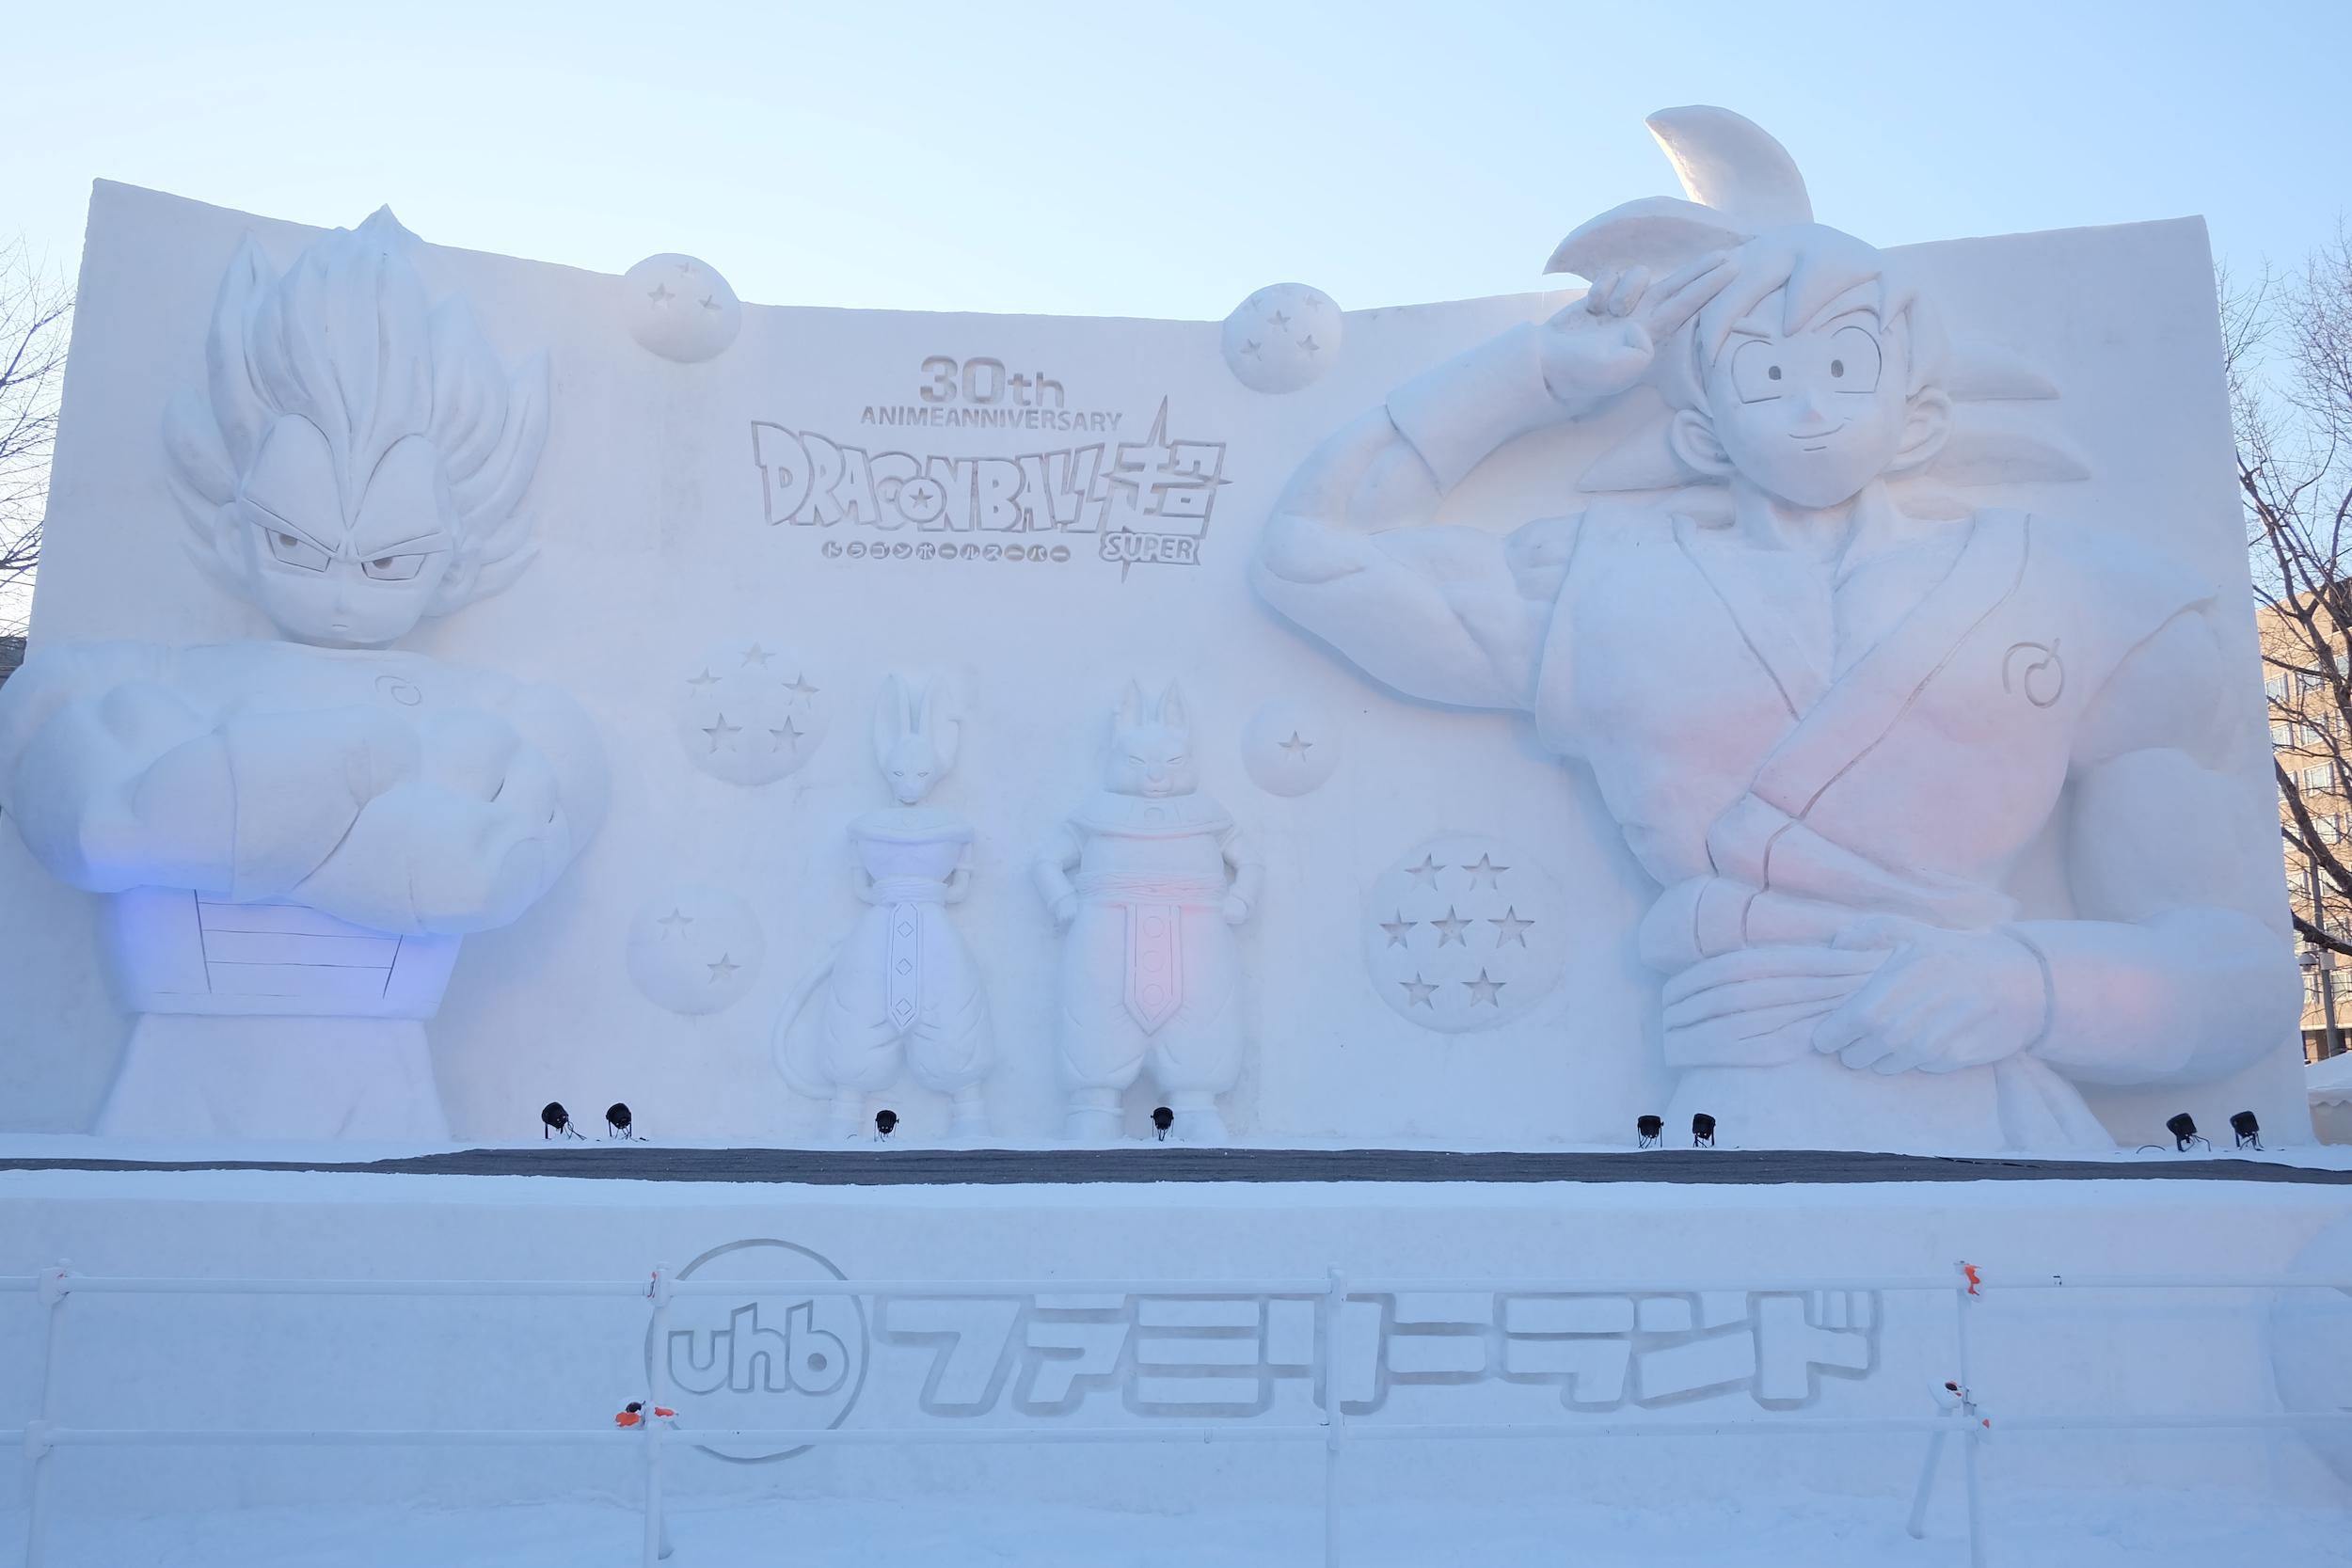 Festival neige Sapporo Japon 4